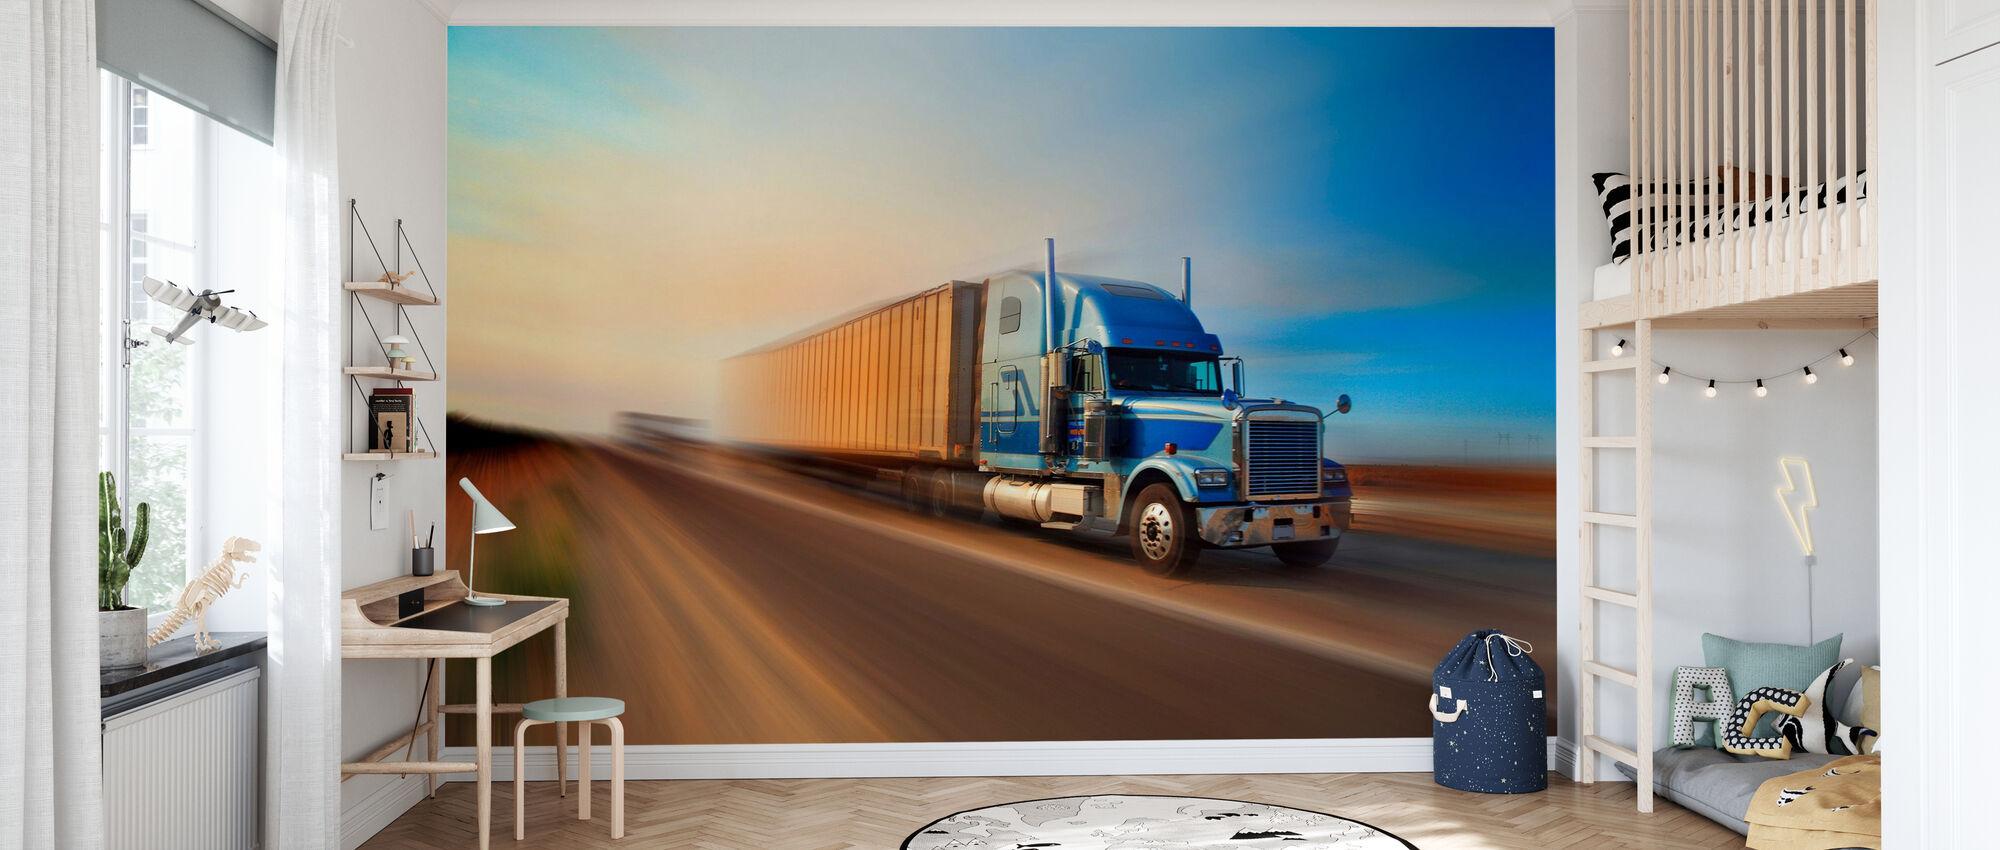 Speeding Truck - Wallpaper - Kids Room